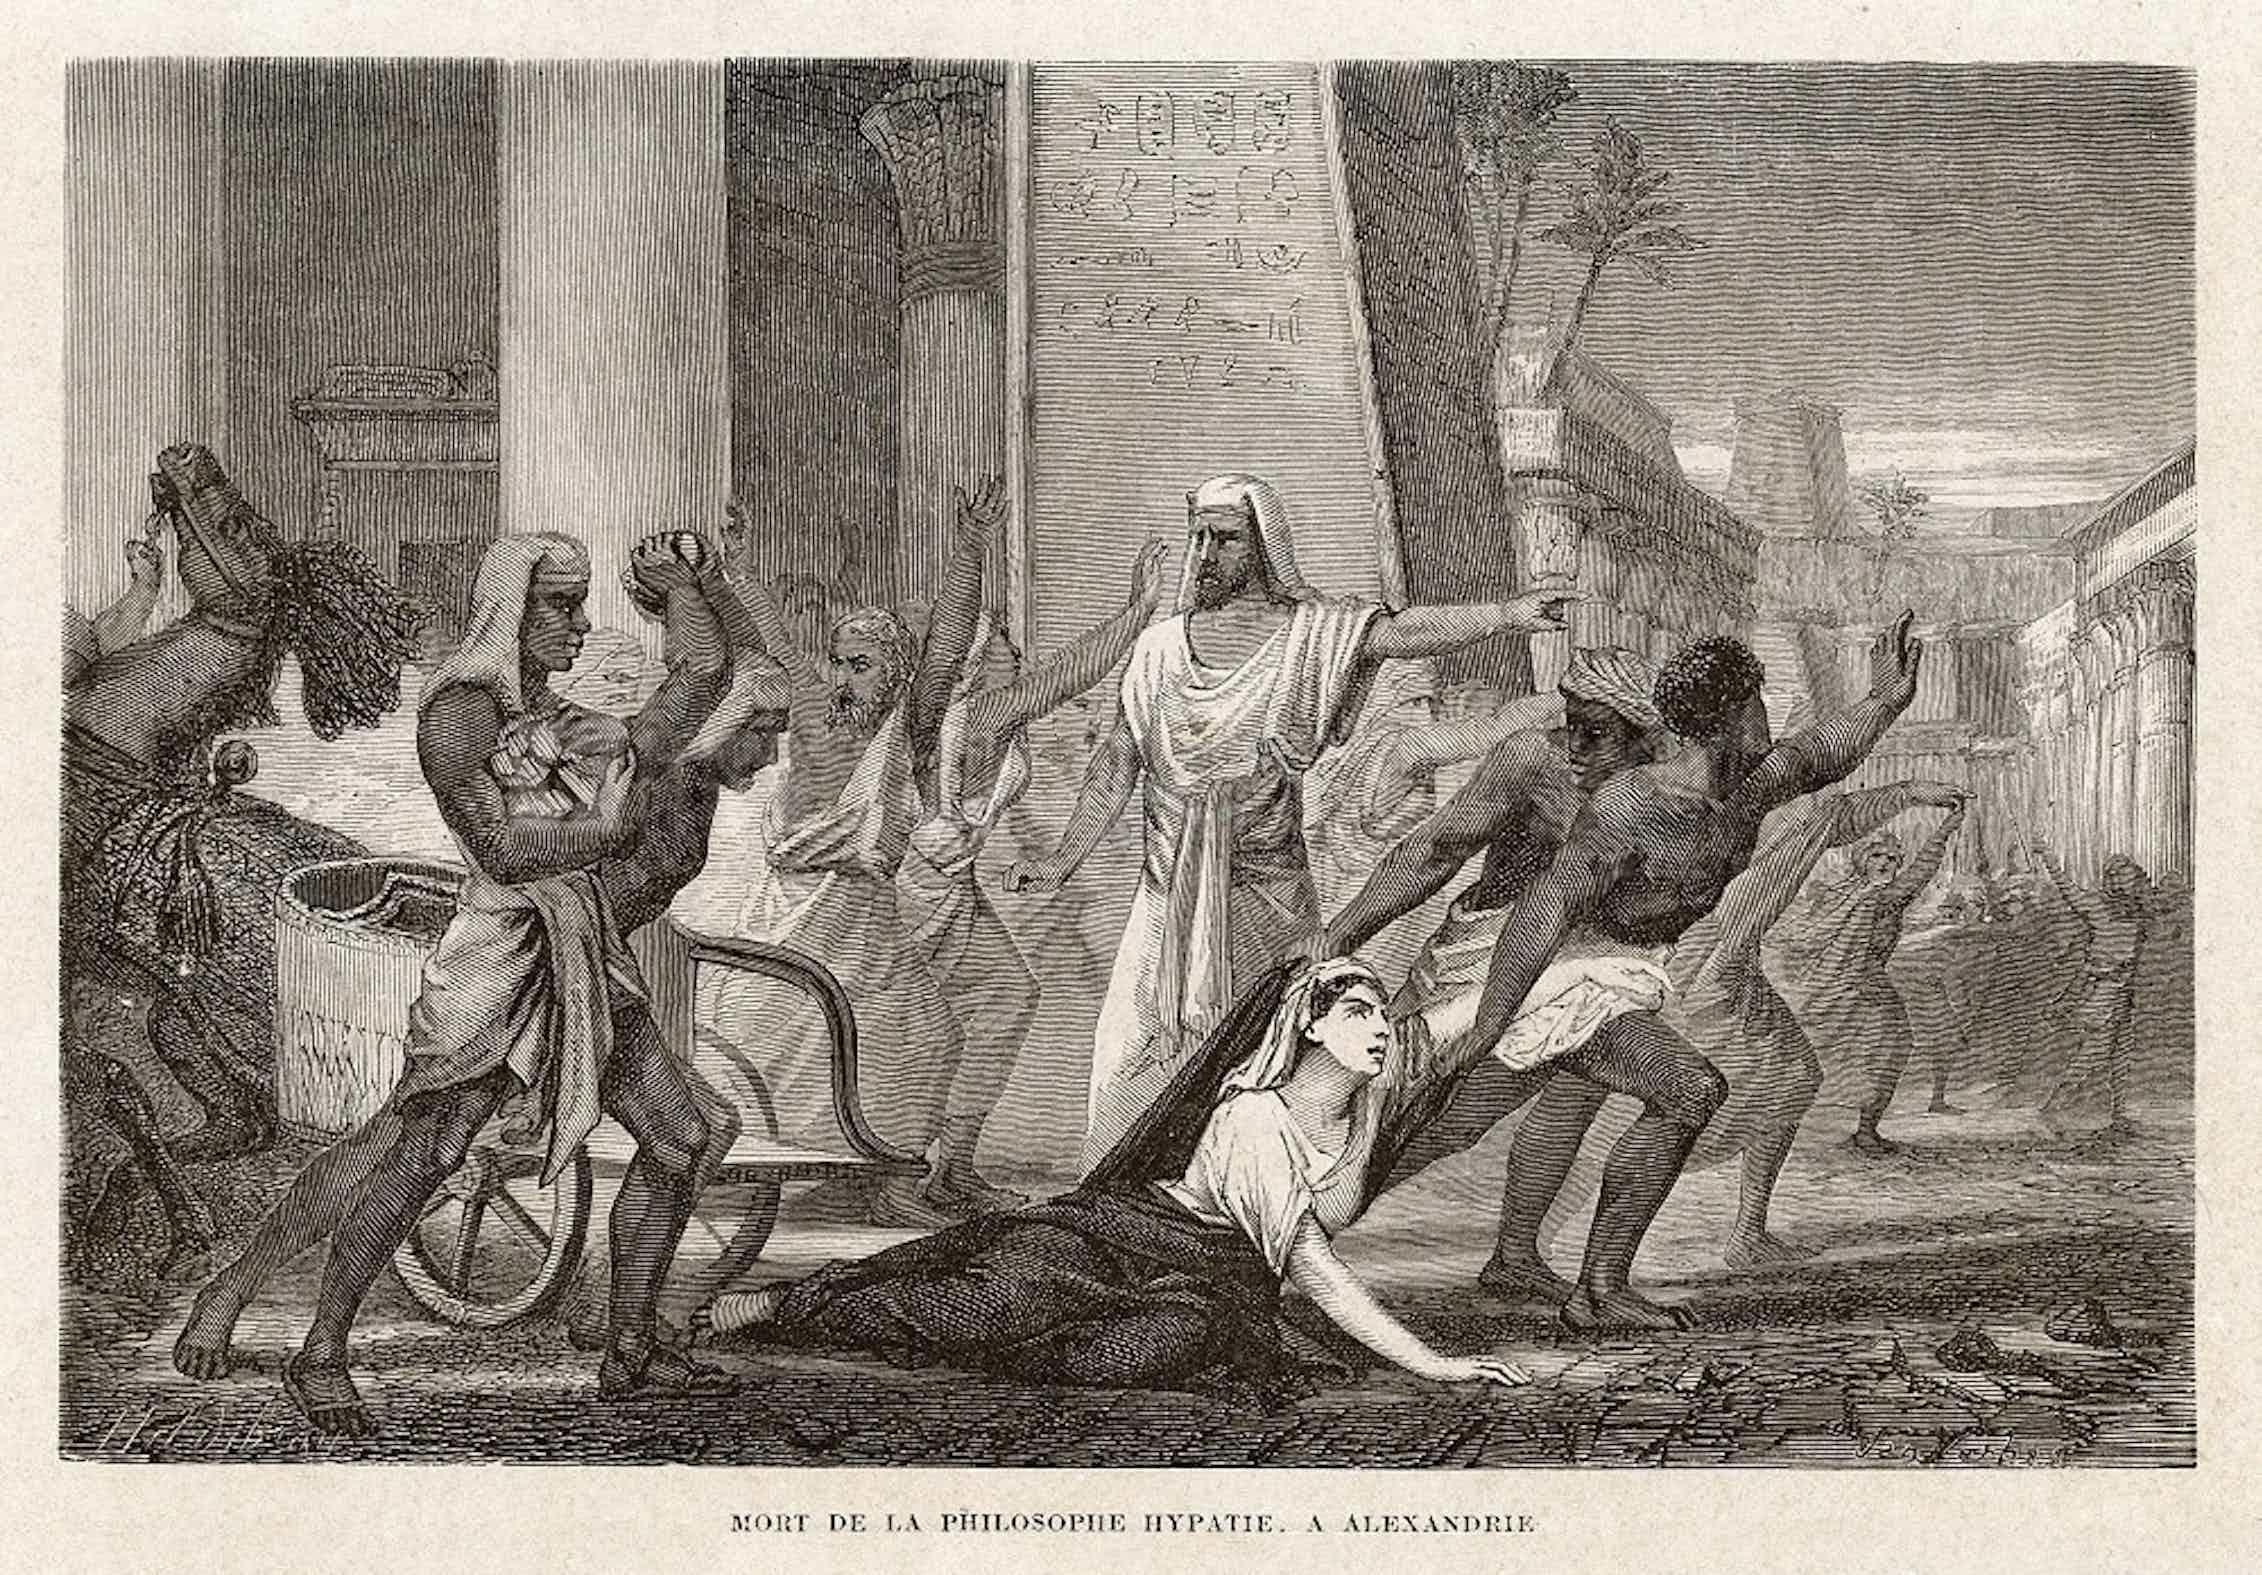 Grabado de 1865 que ilustra el asalto contra Hipatia.Wikimedia Commons